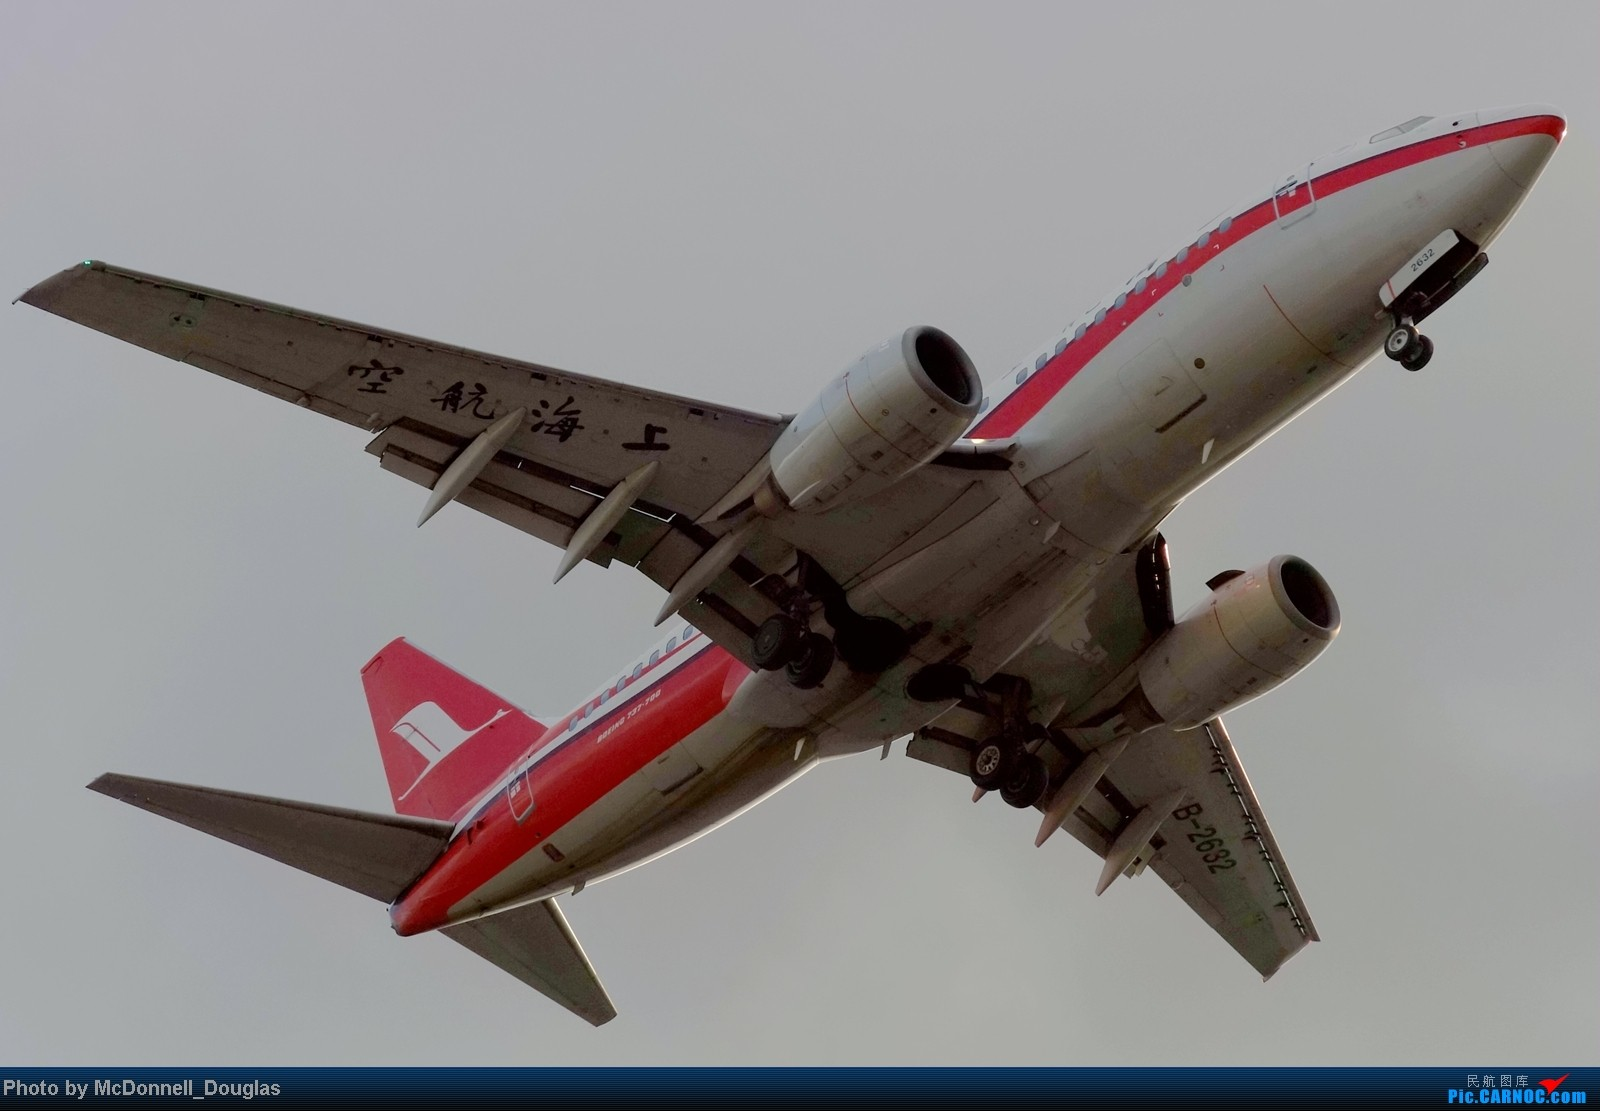 Re:[原创]【上海飞友会】ZSSS杂图一组 BOEING 737-700 B-2632 中国上海虹桥机场